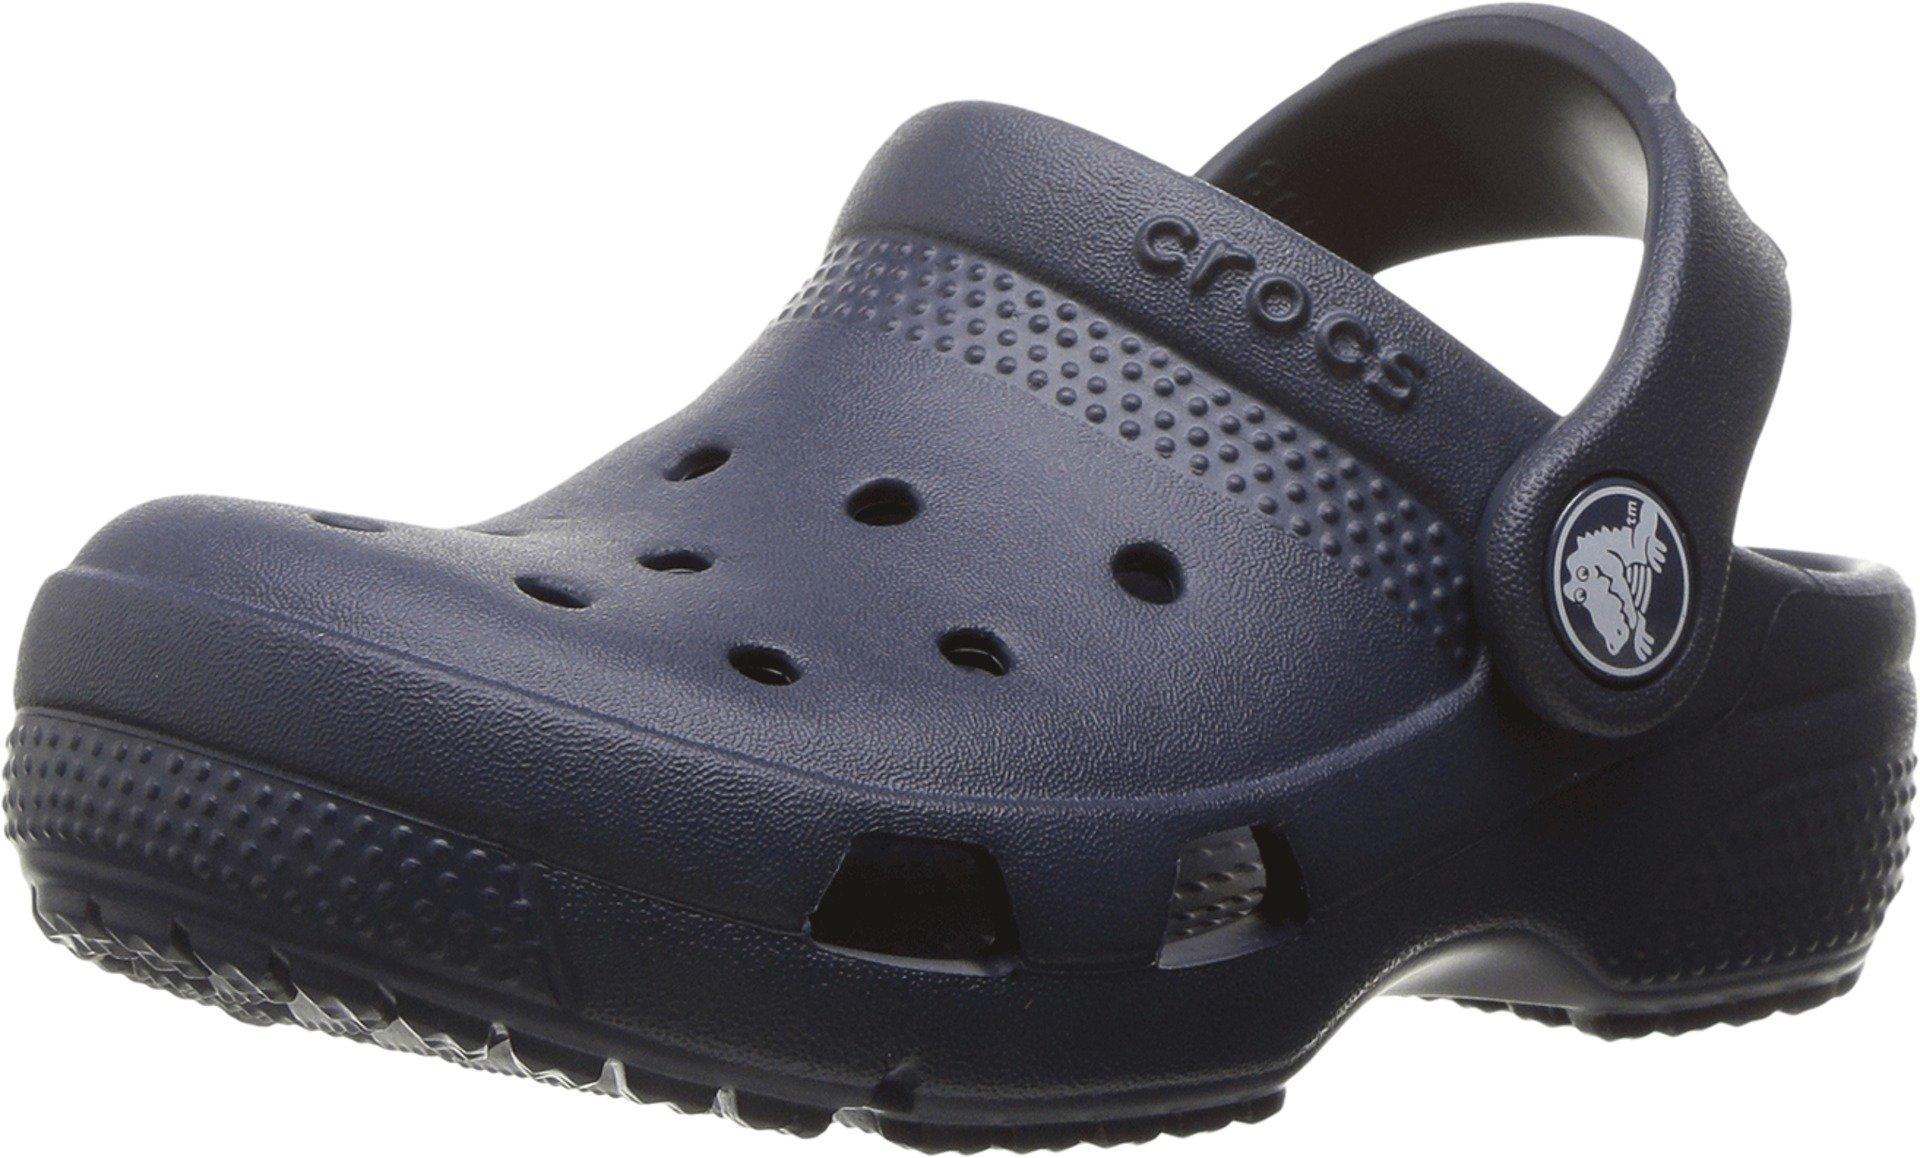 Crocs Kids Unisex Coast Clog (Toddler/Little Kid) Navy 10 M US Toddler